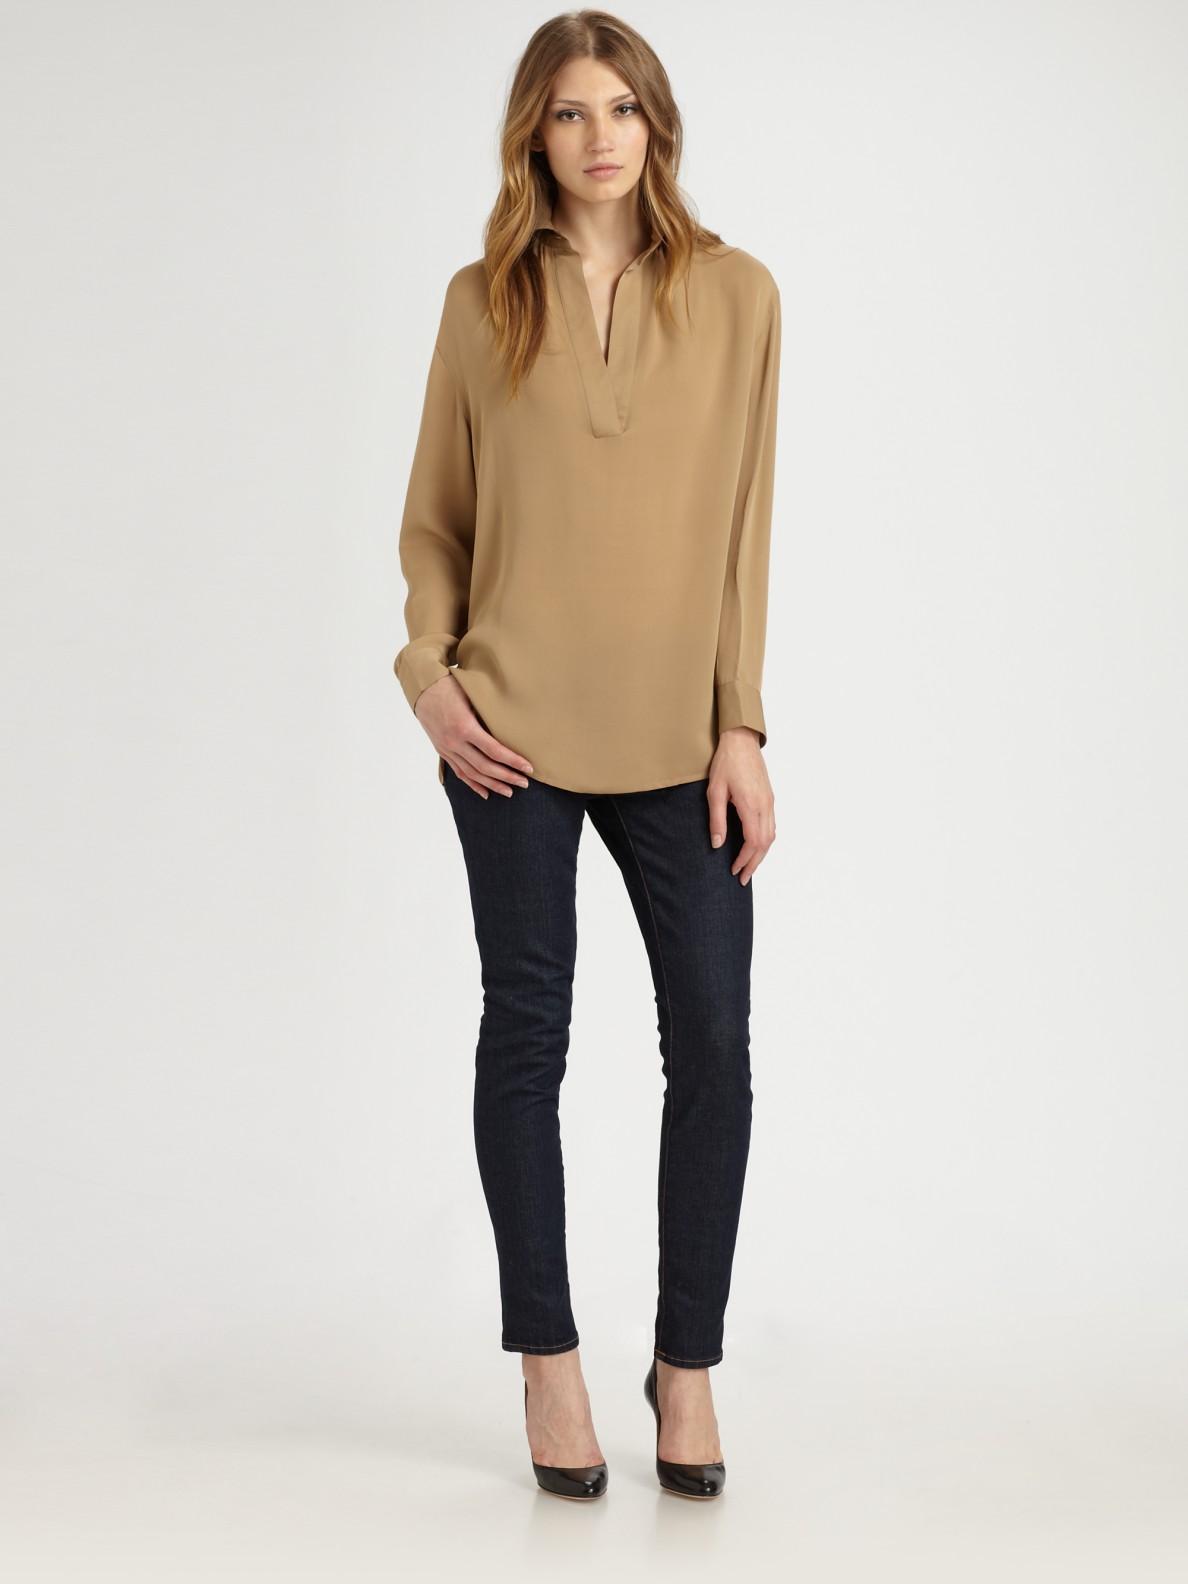 michael michael kors silk blouse in brown black lyst. Black Bedroom Furniture Sets. Home Design Ideas